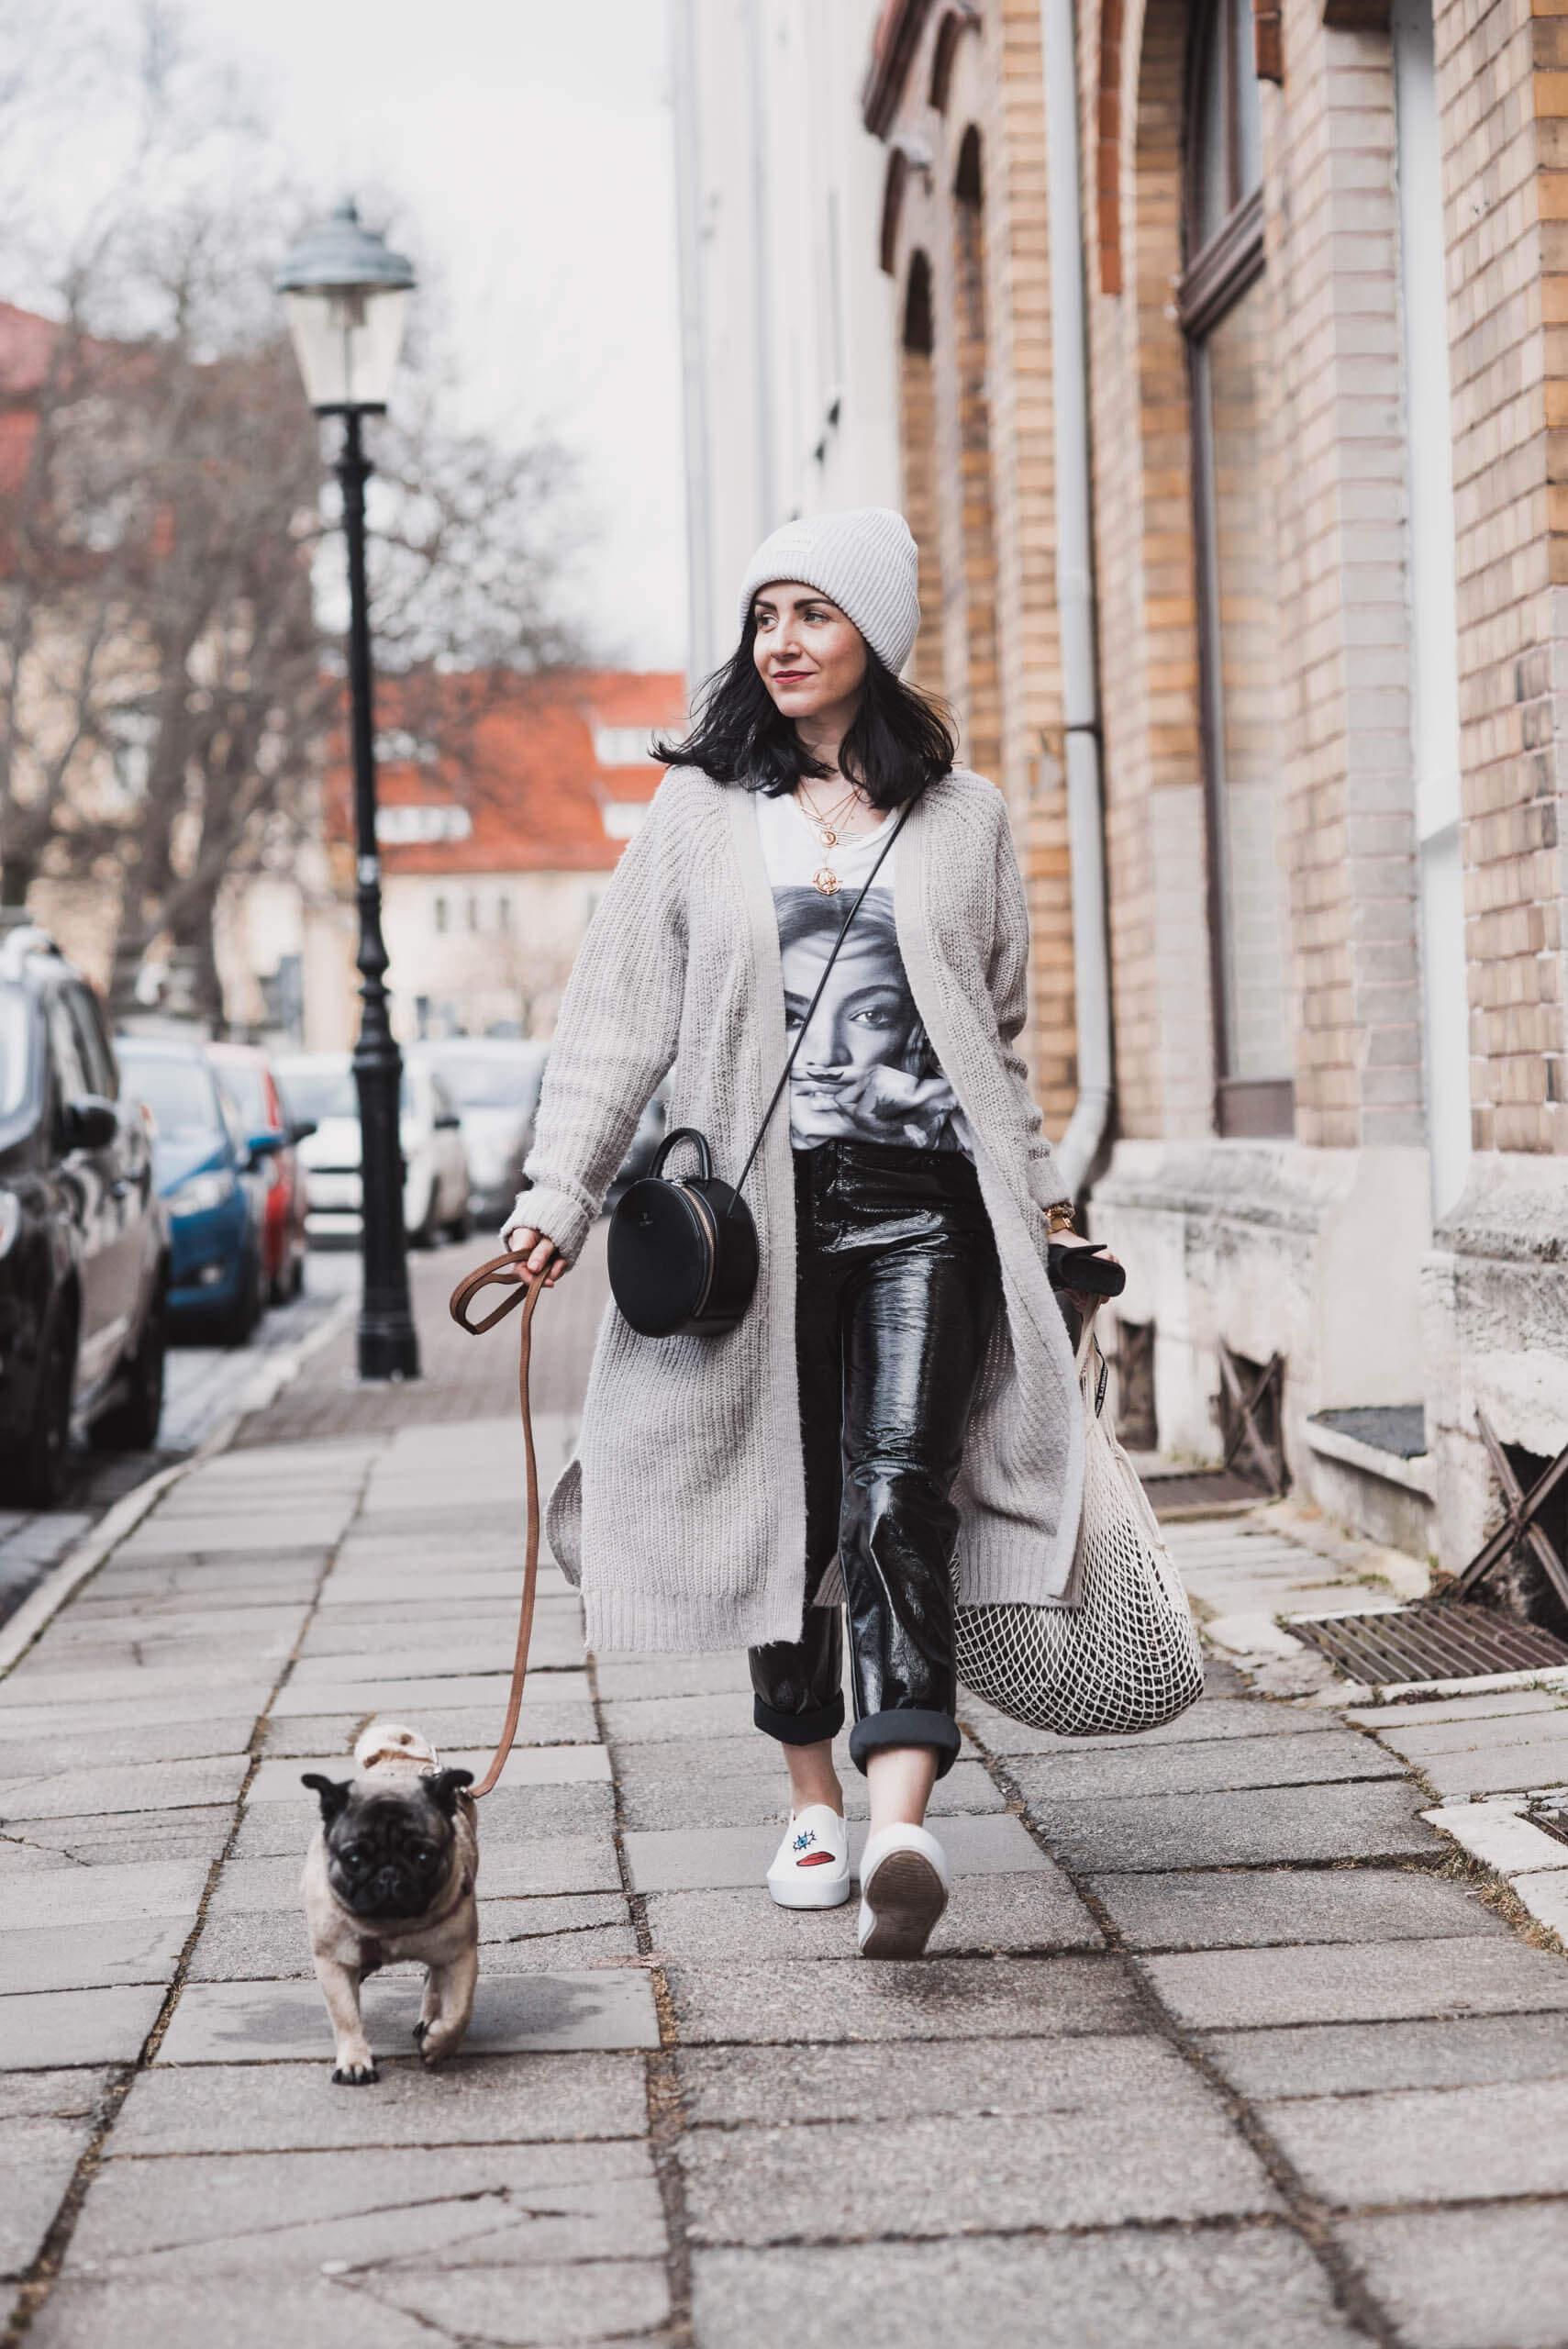 Lieblingsteil Cardigan - Strickjacken Trends 2020 Julies Dresscode Fashion & Lifestyle Blog